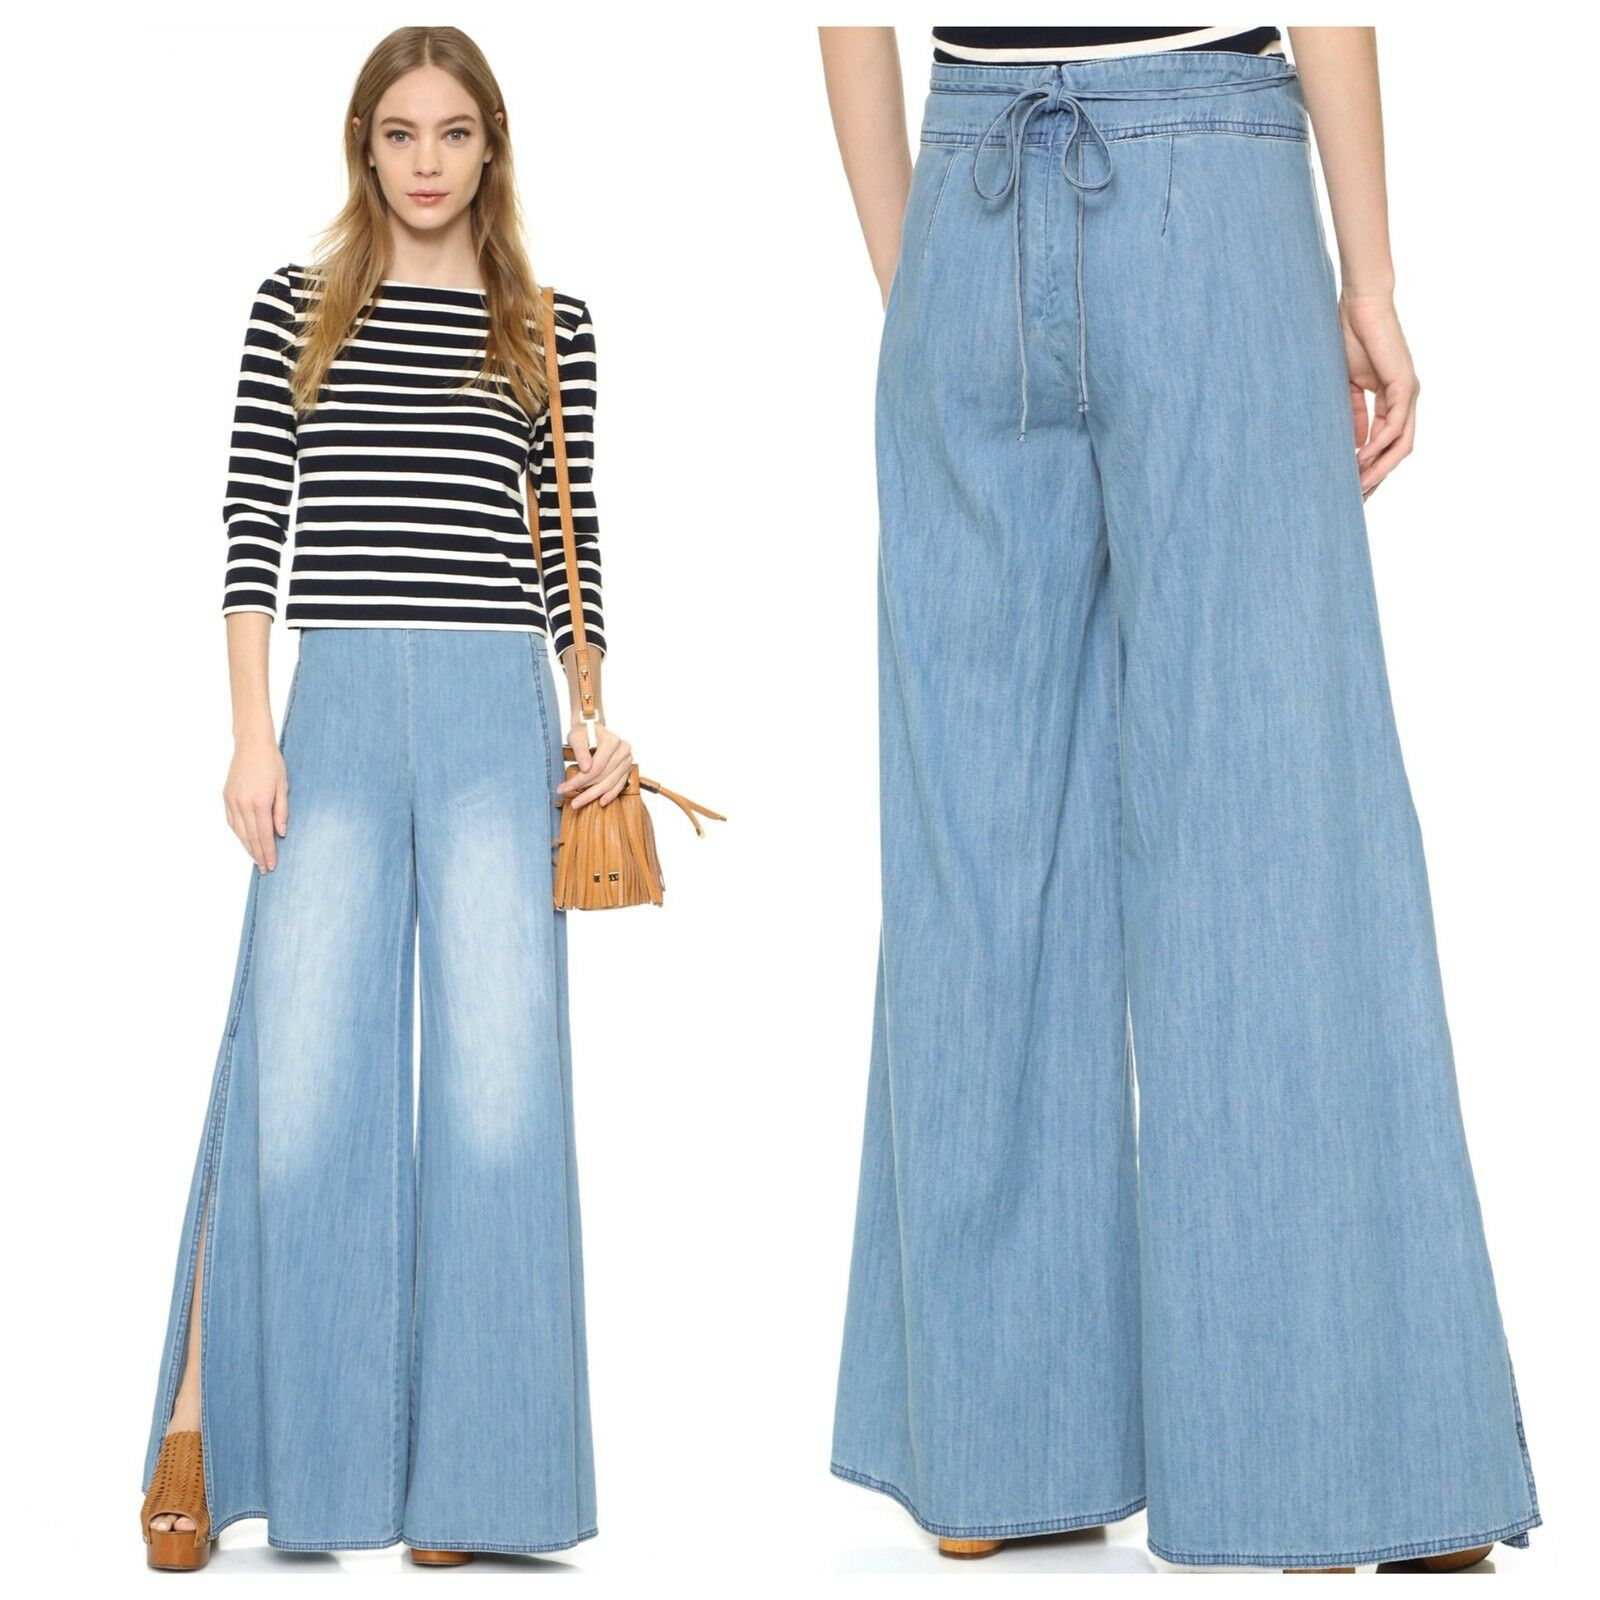 NEW Free People Ramona Wide Leg Side Split Jeans Size 8 Apron Denim Pant